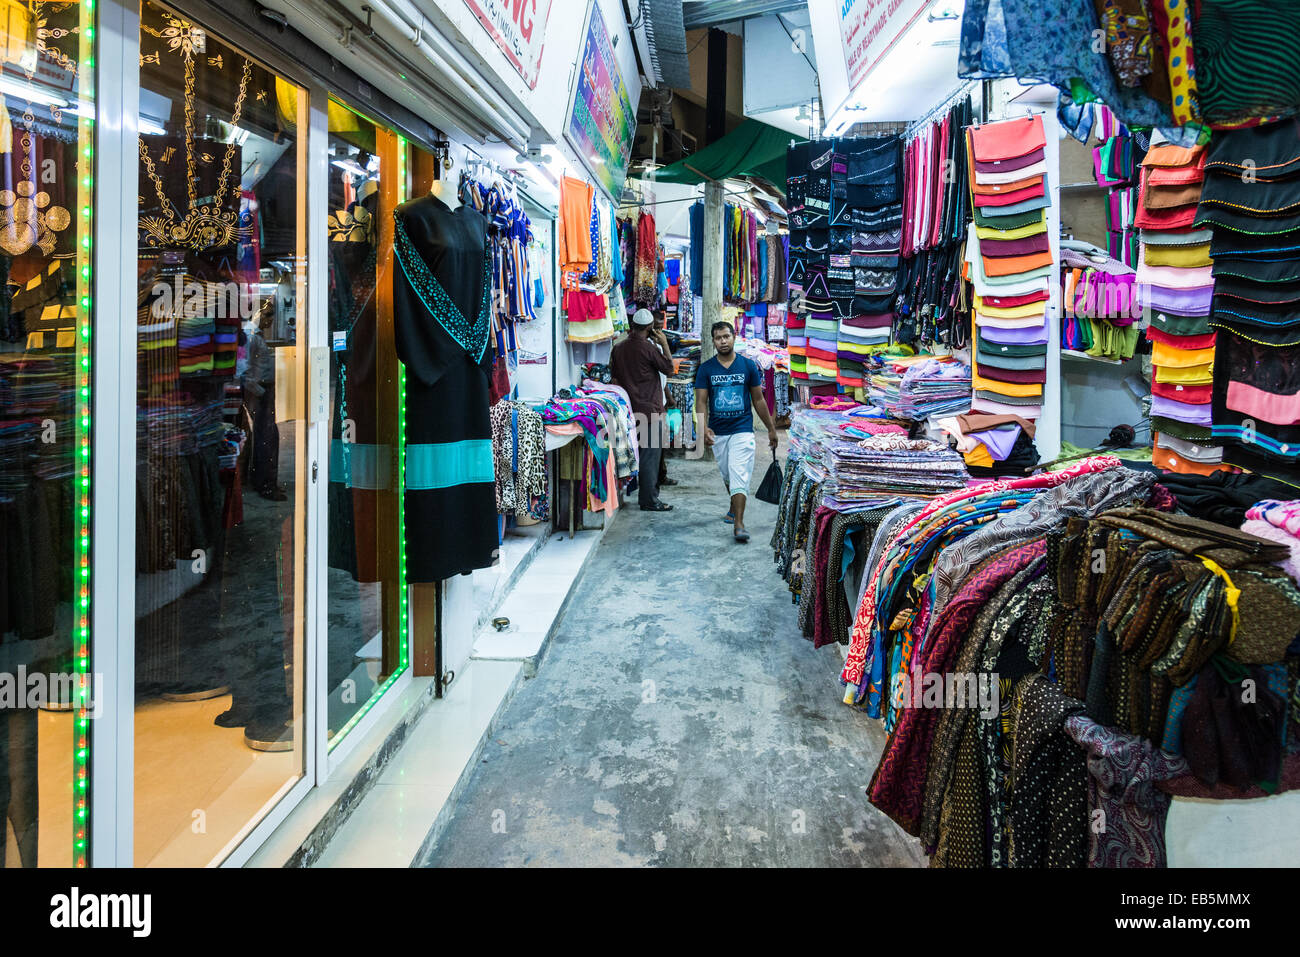 Muscat Street Stock Photos & Muscat Street Stock Images - Alamy